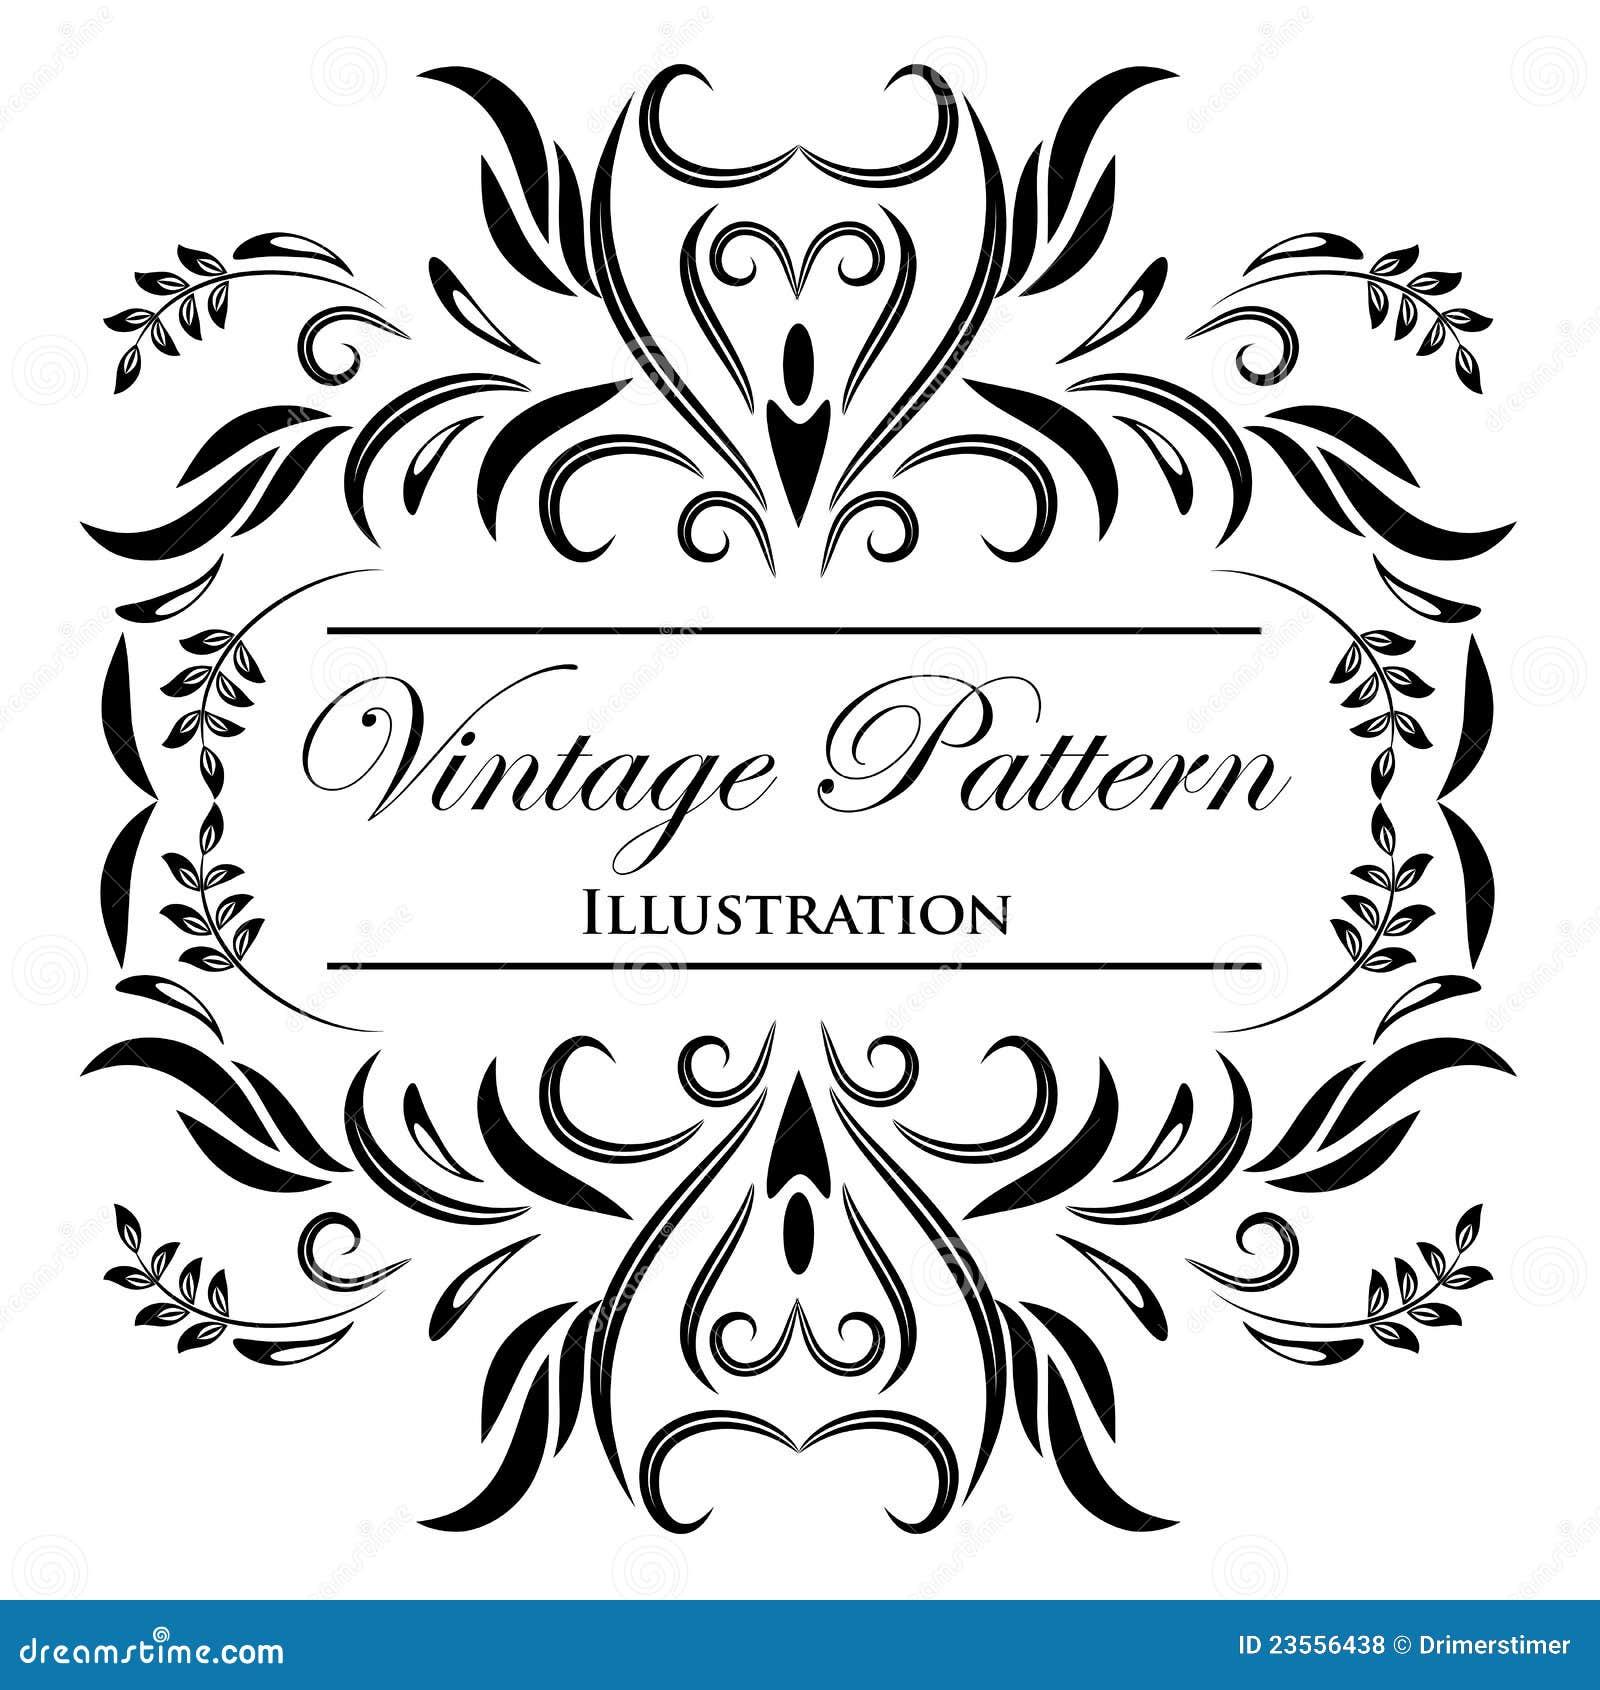 Element Design : Design element on a white background stock illustration